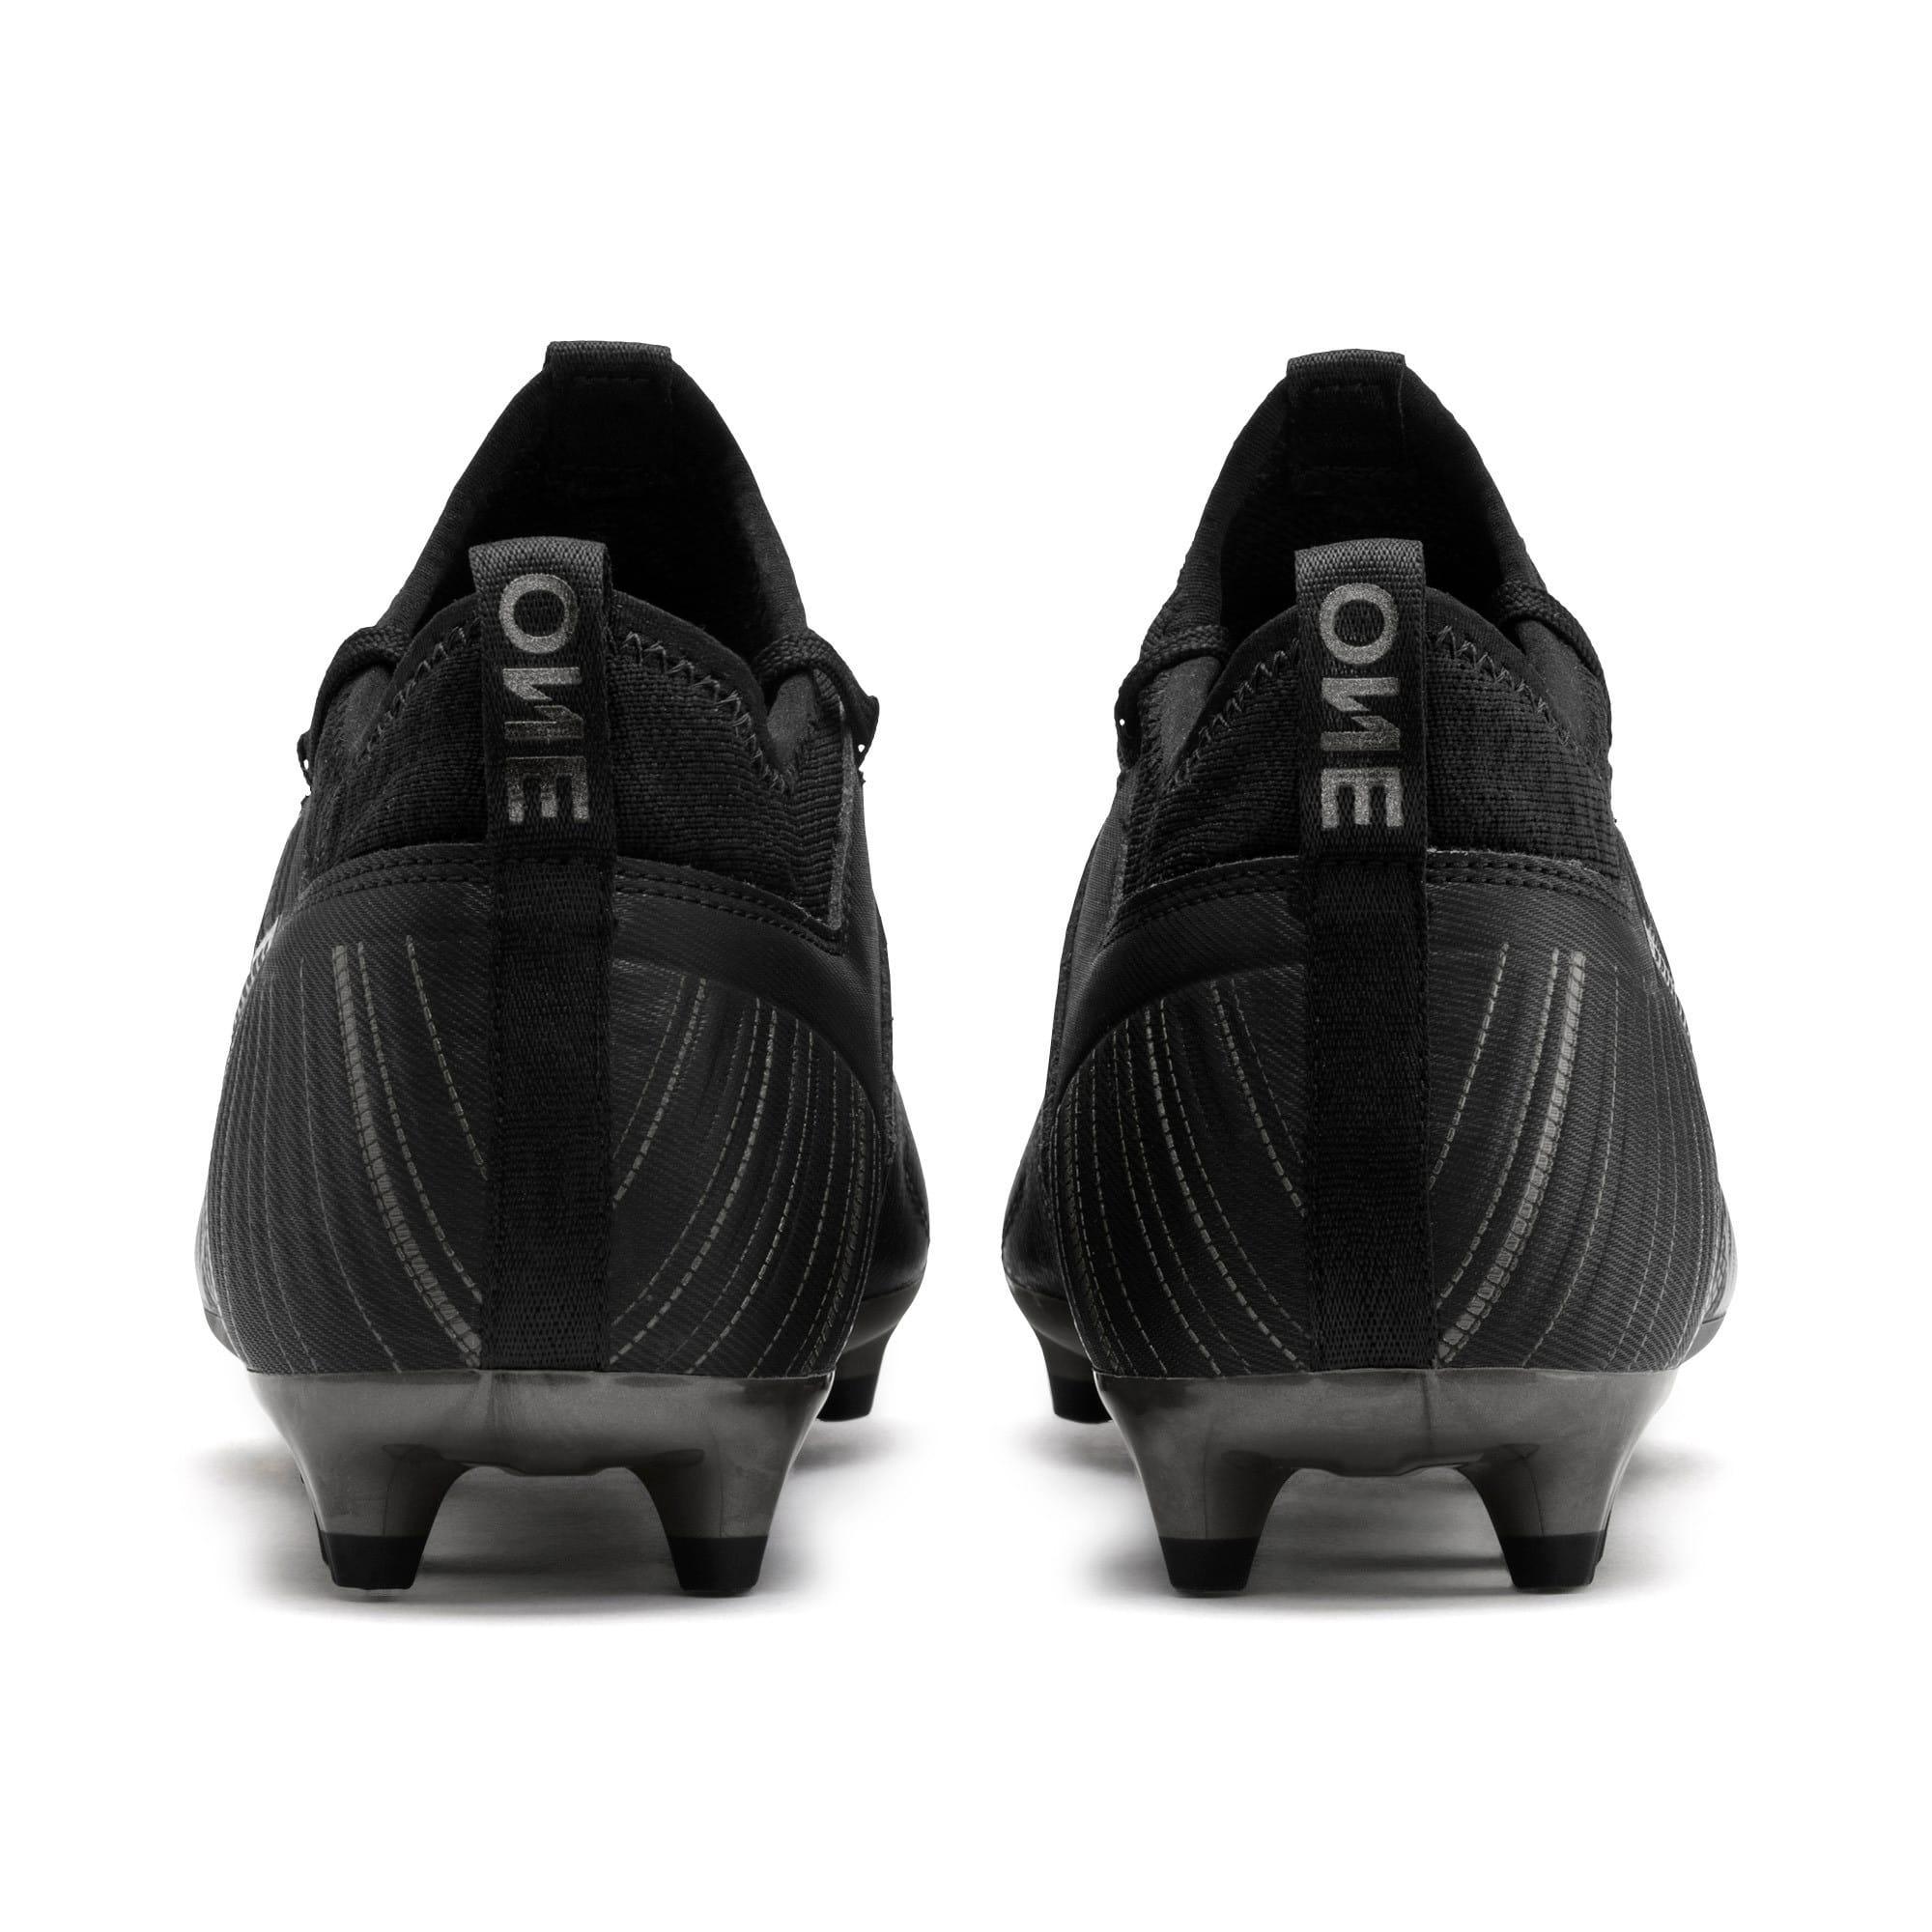 Thumbnail 4 of PUMA ONE 5.3 FG/AG Men's Soccer Cleats, Black-Black-Puma Aged Silver, medium